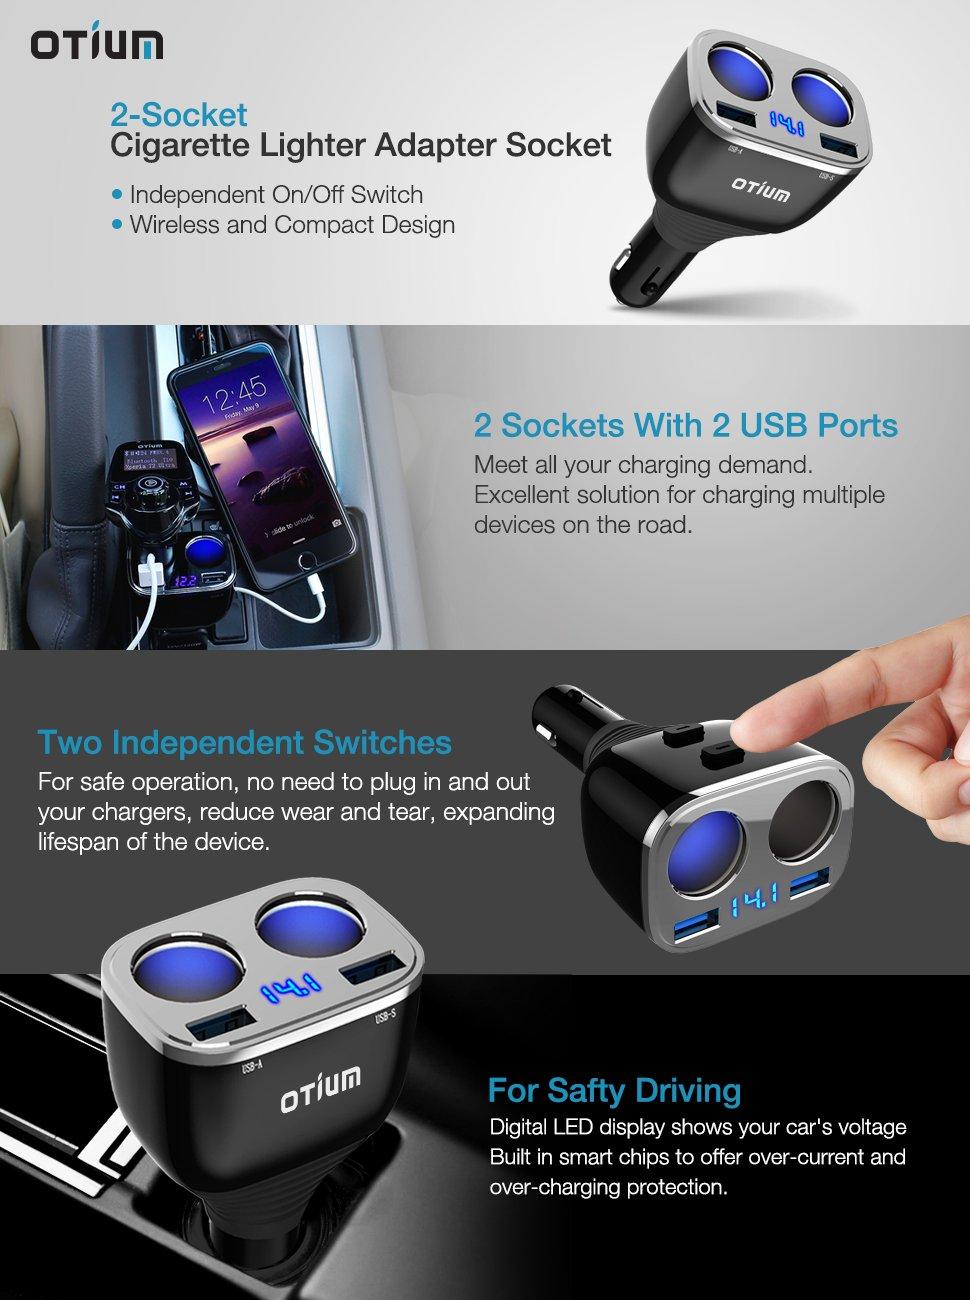 Otium 2-Socket Cigarette Lighter Adapter Socket Dual Car Charger $8.90 AC